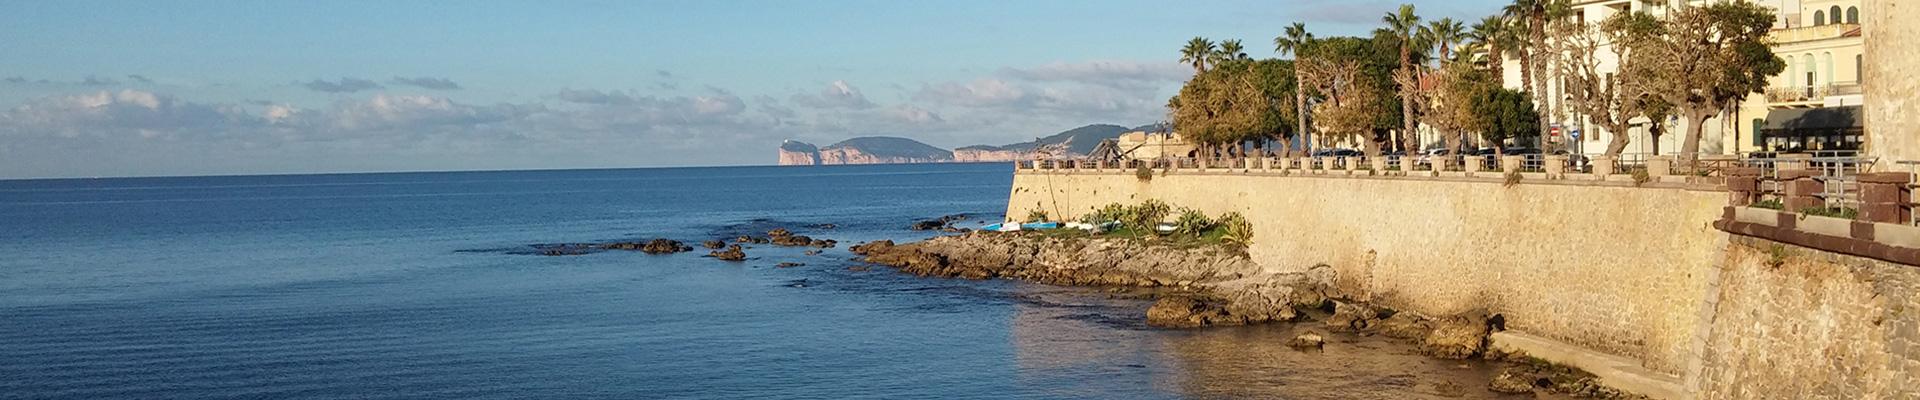 Bed & Breakfast Pintadera - Alghero